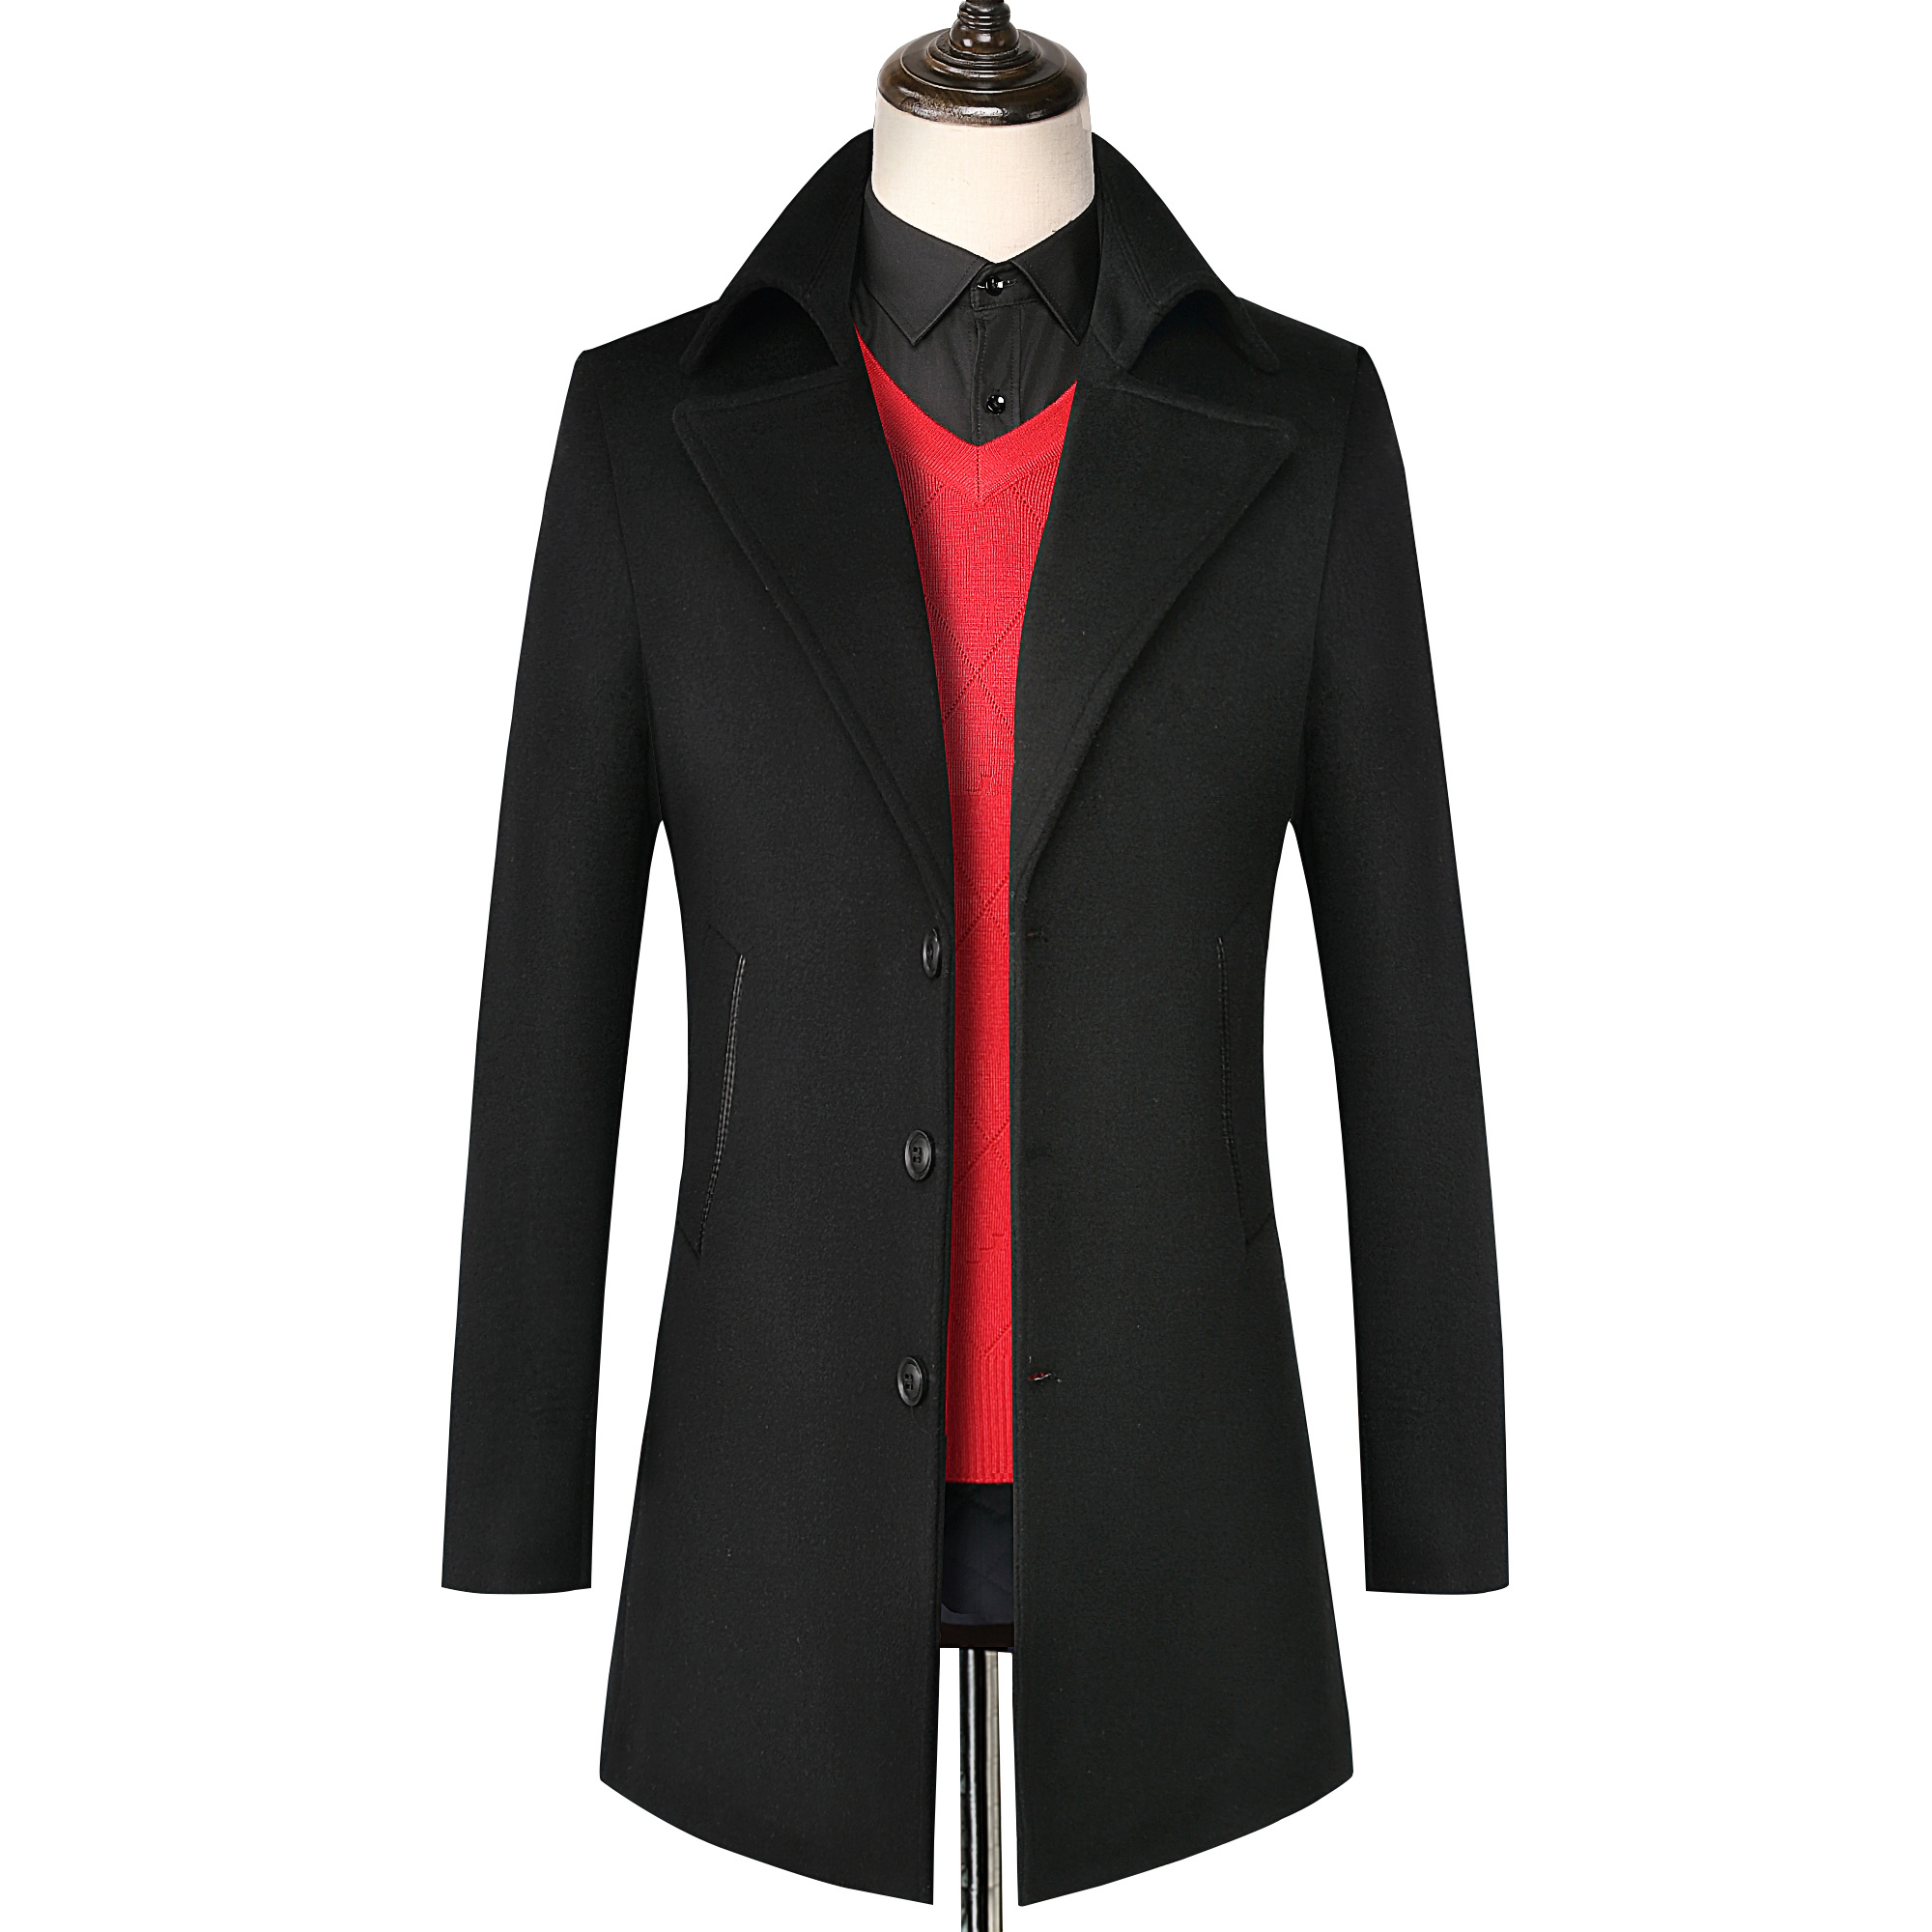 Mens   Trench   Coat 2019 New Fashion Men Long wool Coat Autumn Winter single-breasted Windproof Slim windbreaker classic   Trench   Coa